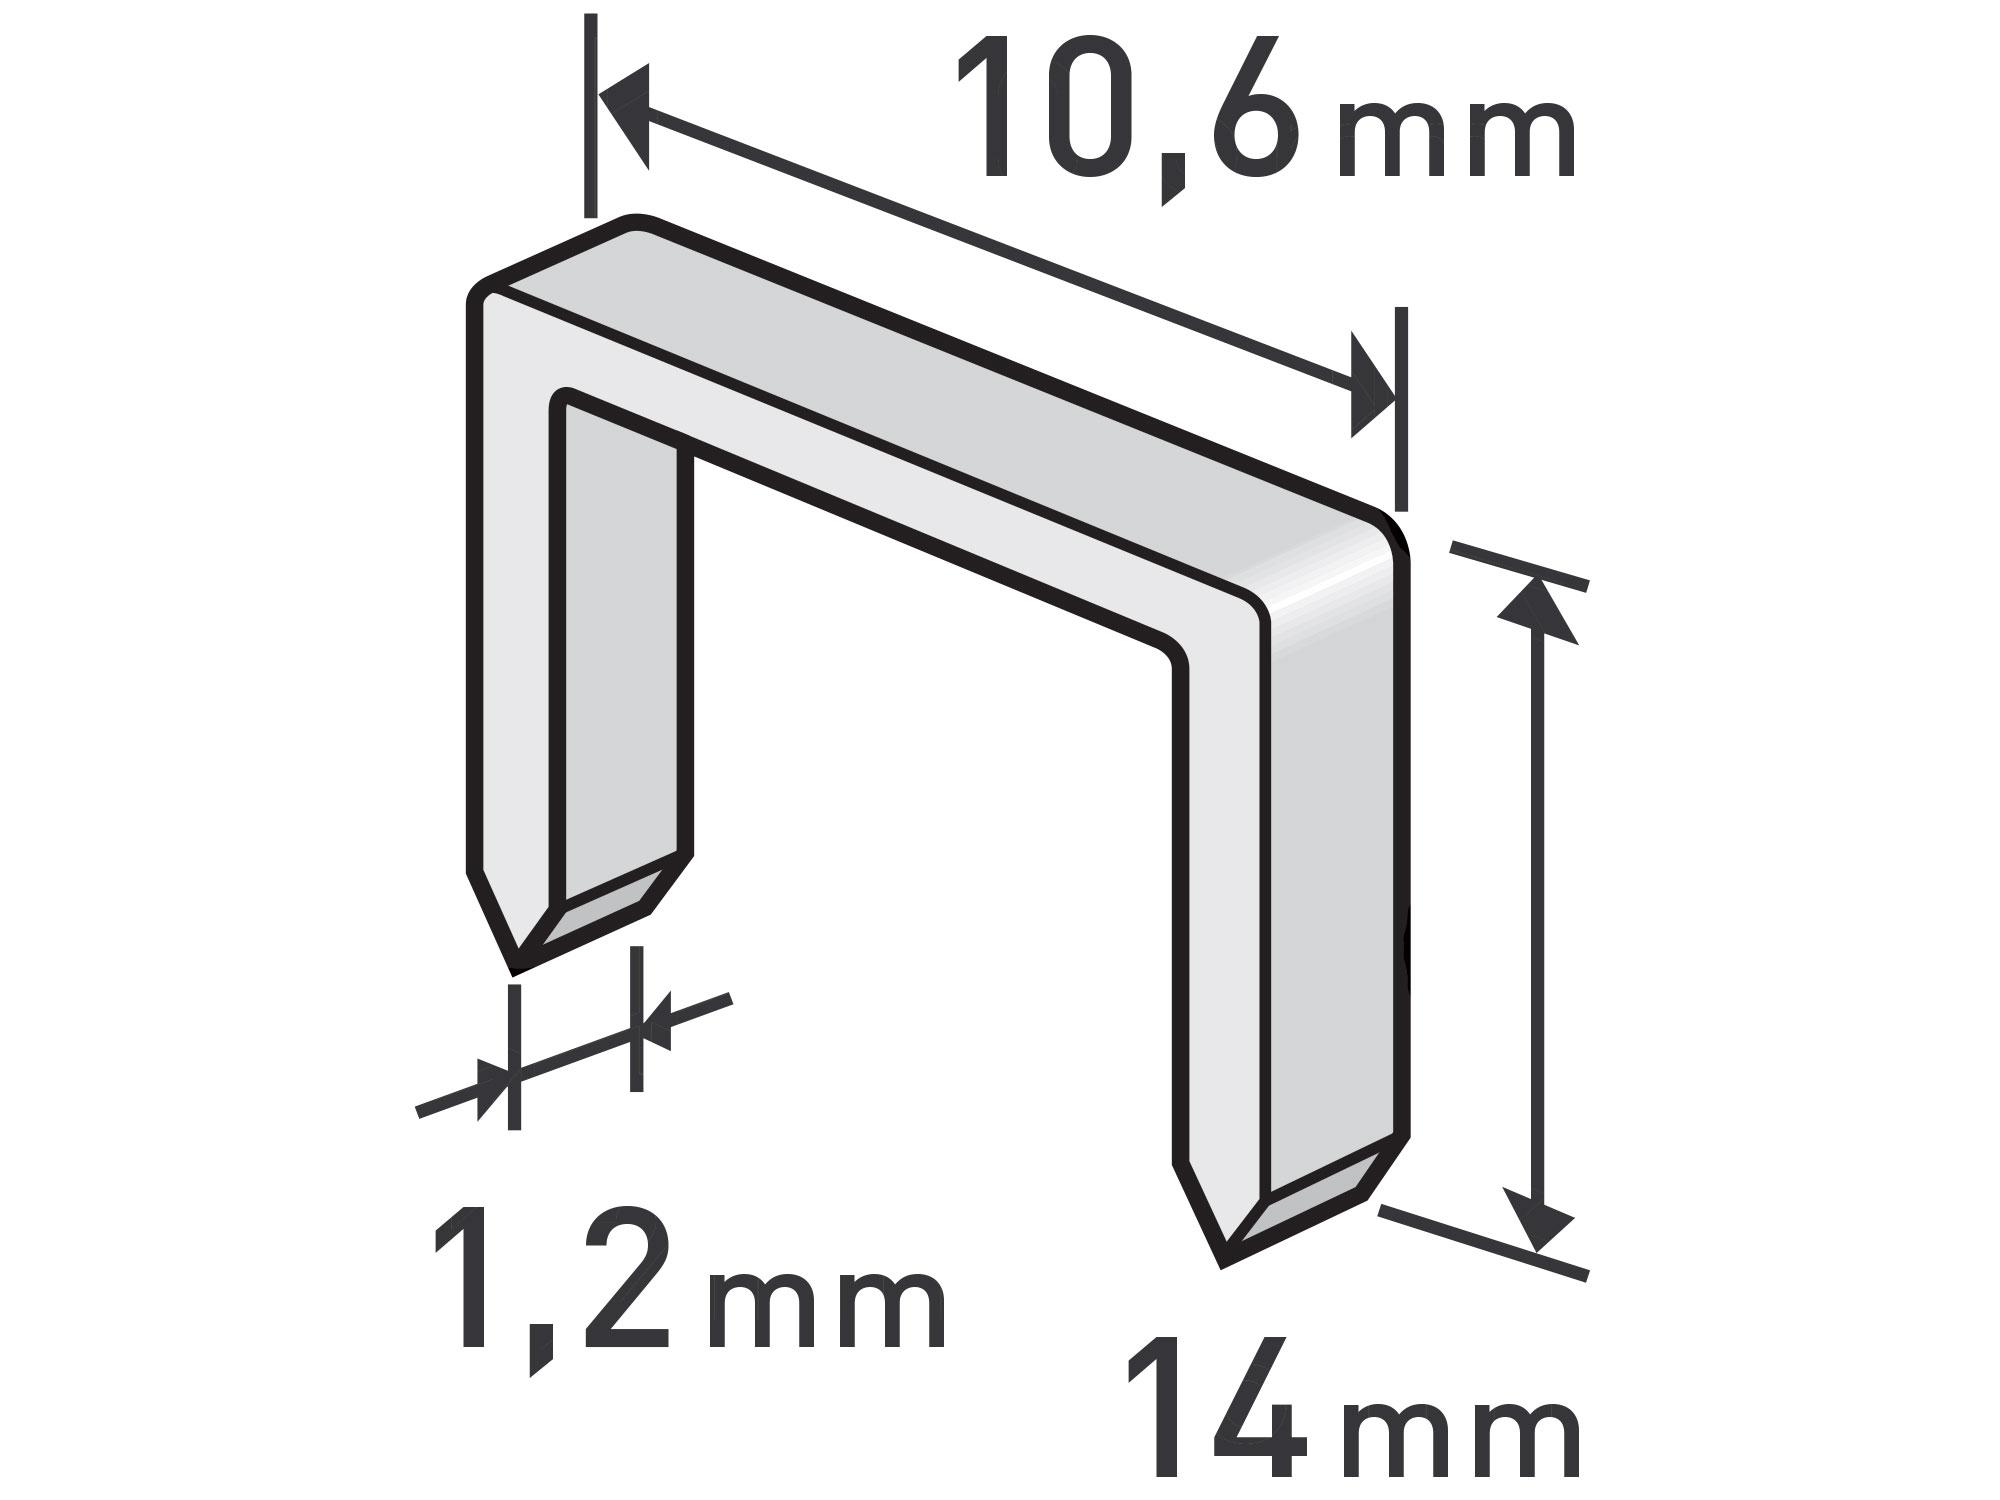 Spony 14mm, 1000ks, 10,6x1,2mm